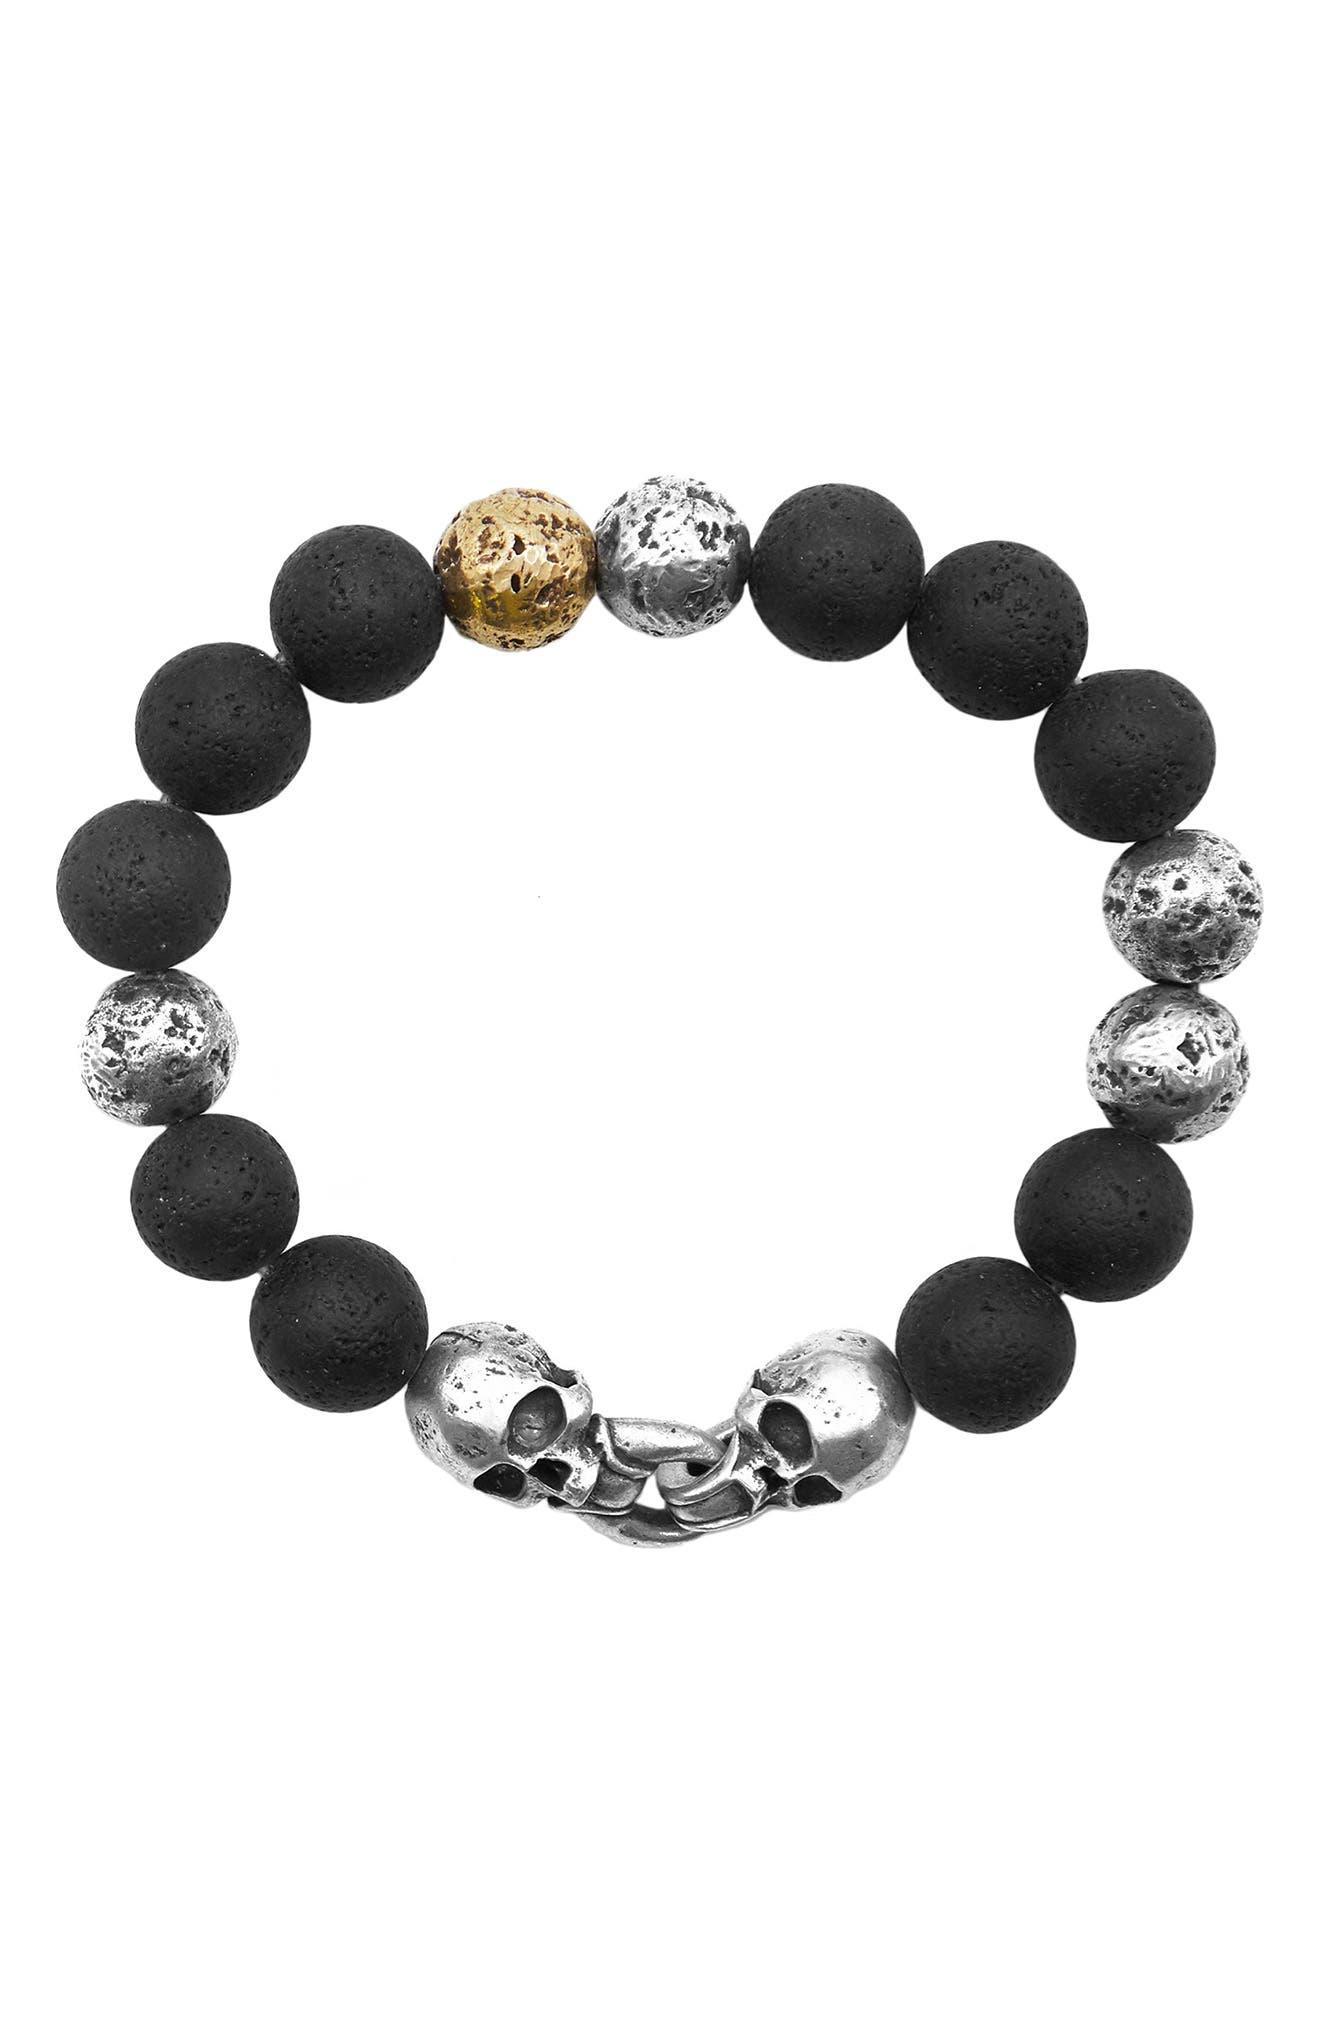 Women's John Varvatos Distressed Sterling Silver & Stone Skull Bead Bracelet